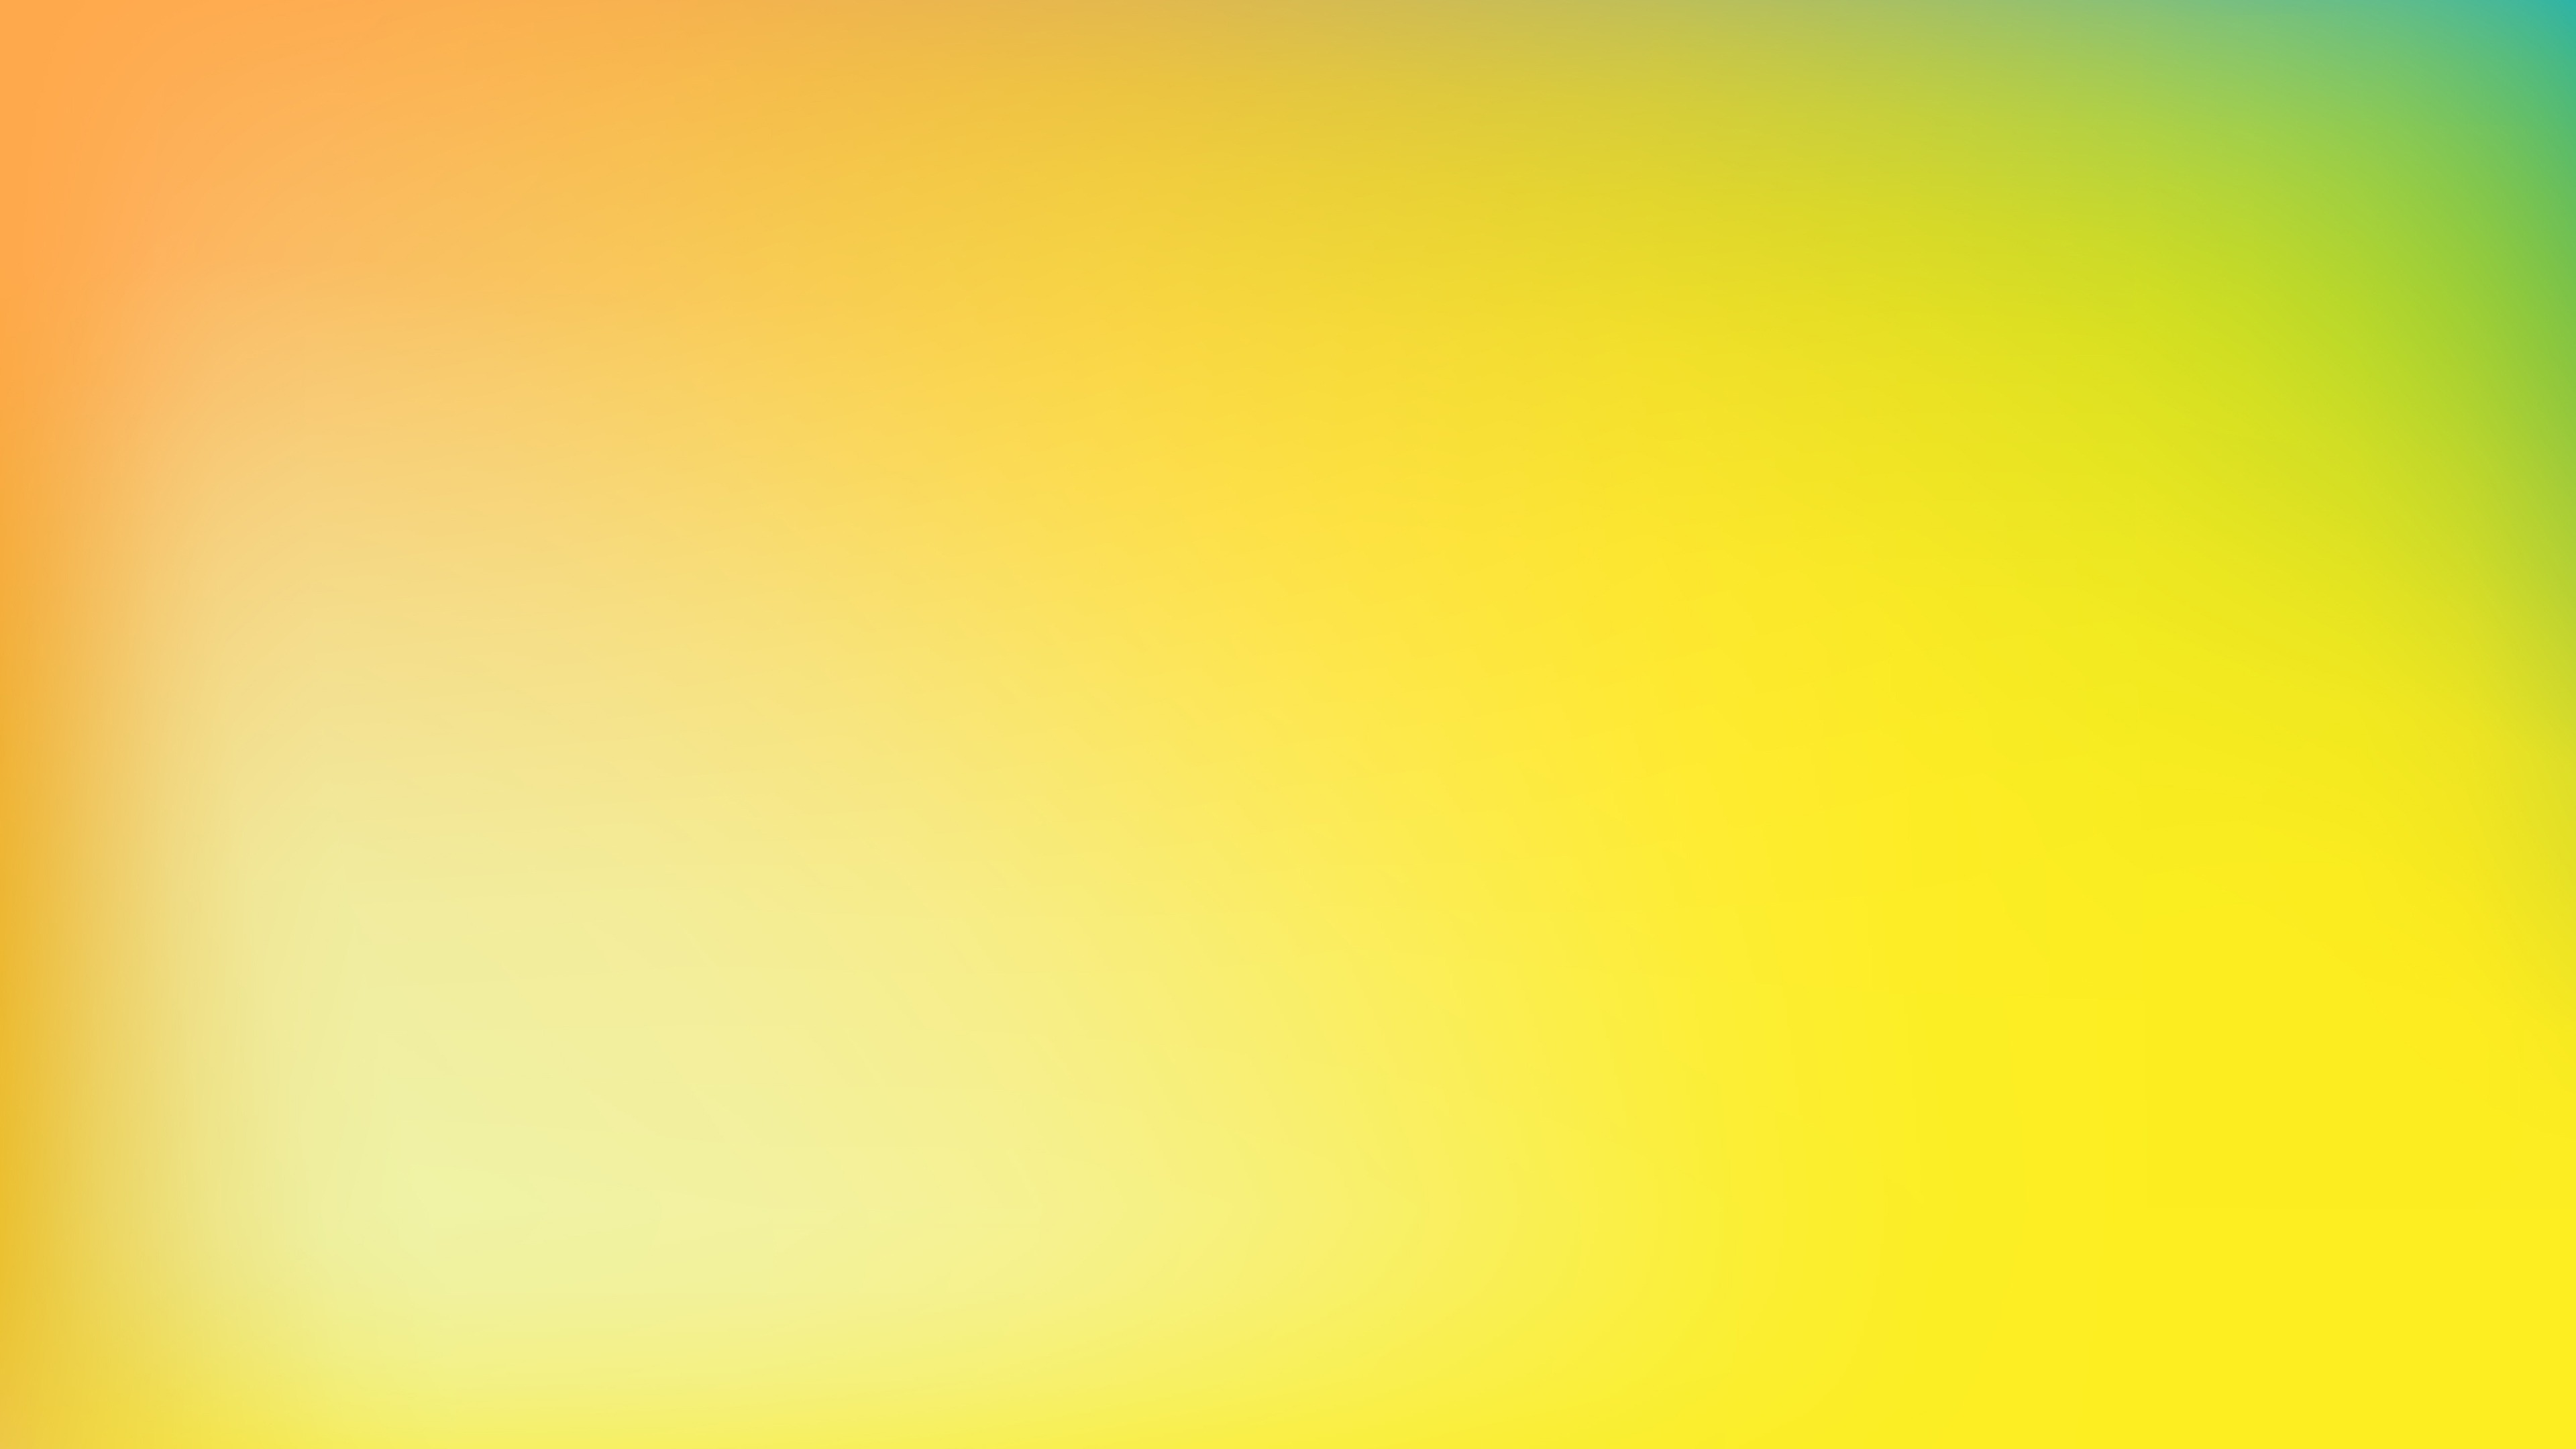 Amarillo Naranja Verde Degradado Dise 241 O Avance